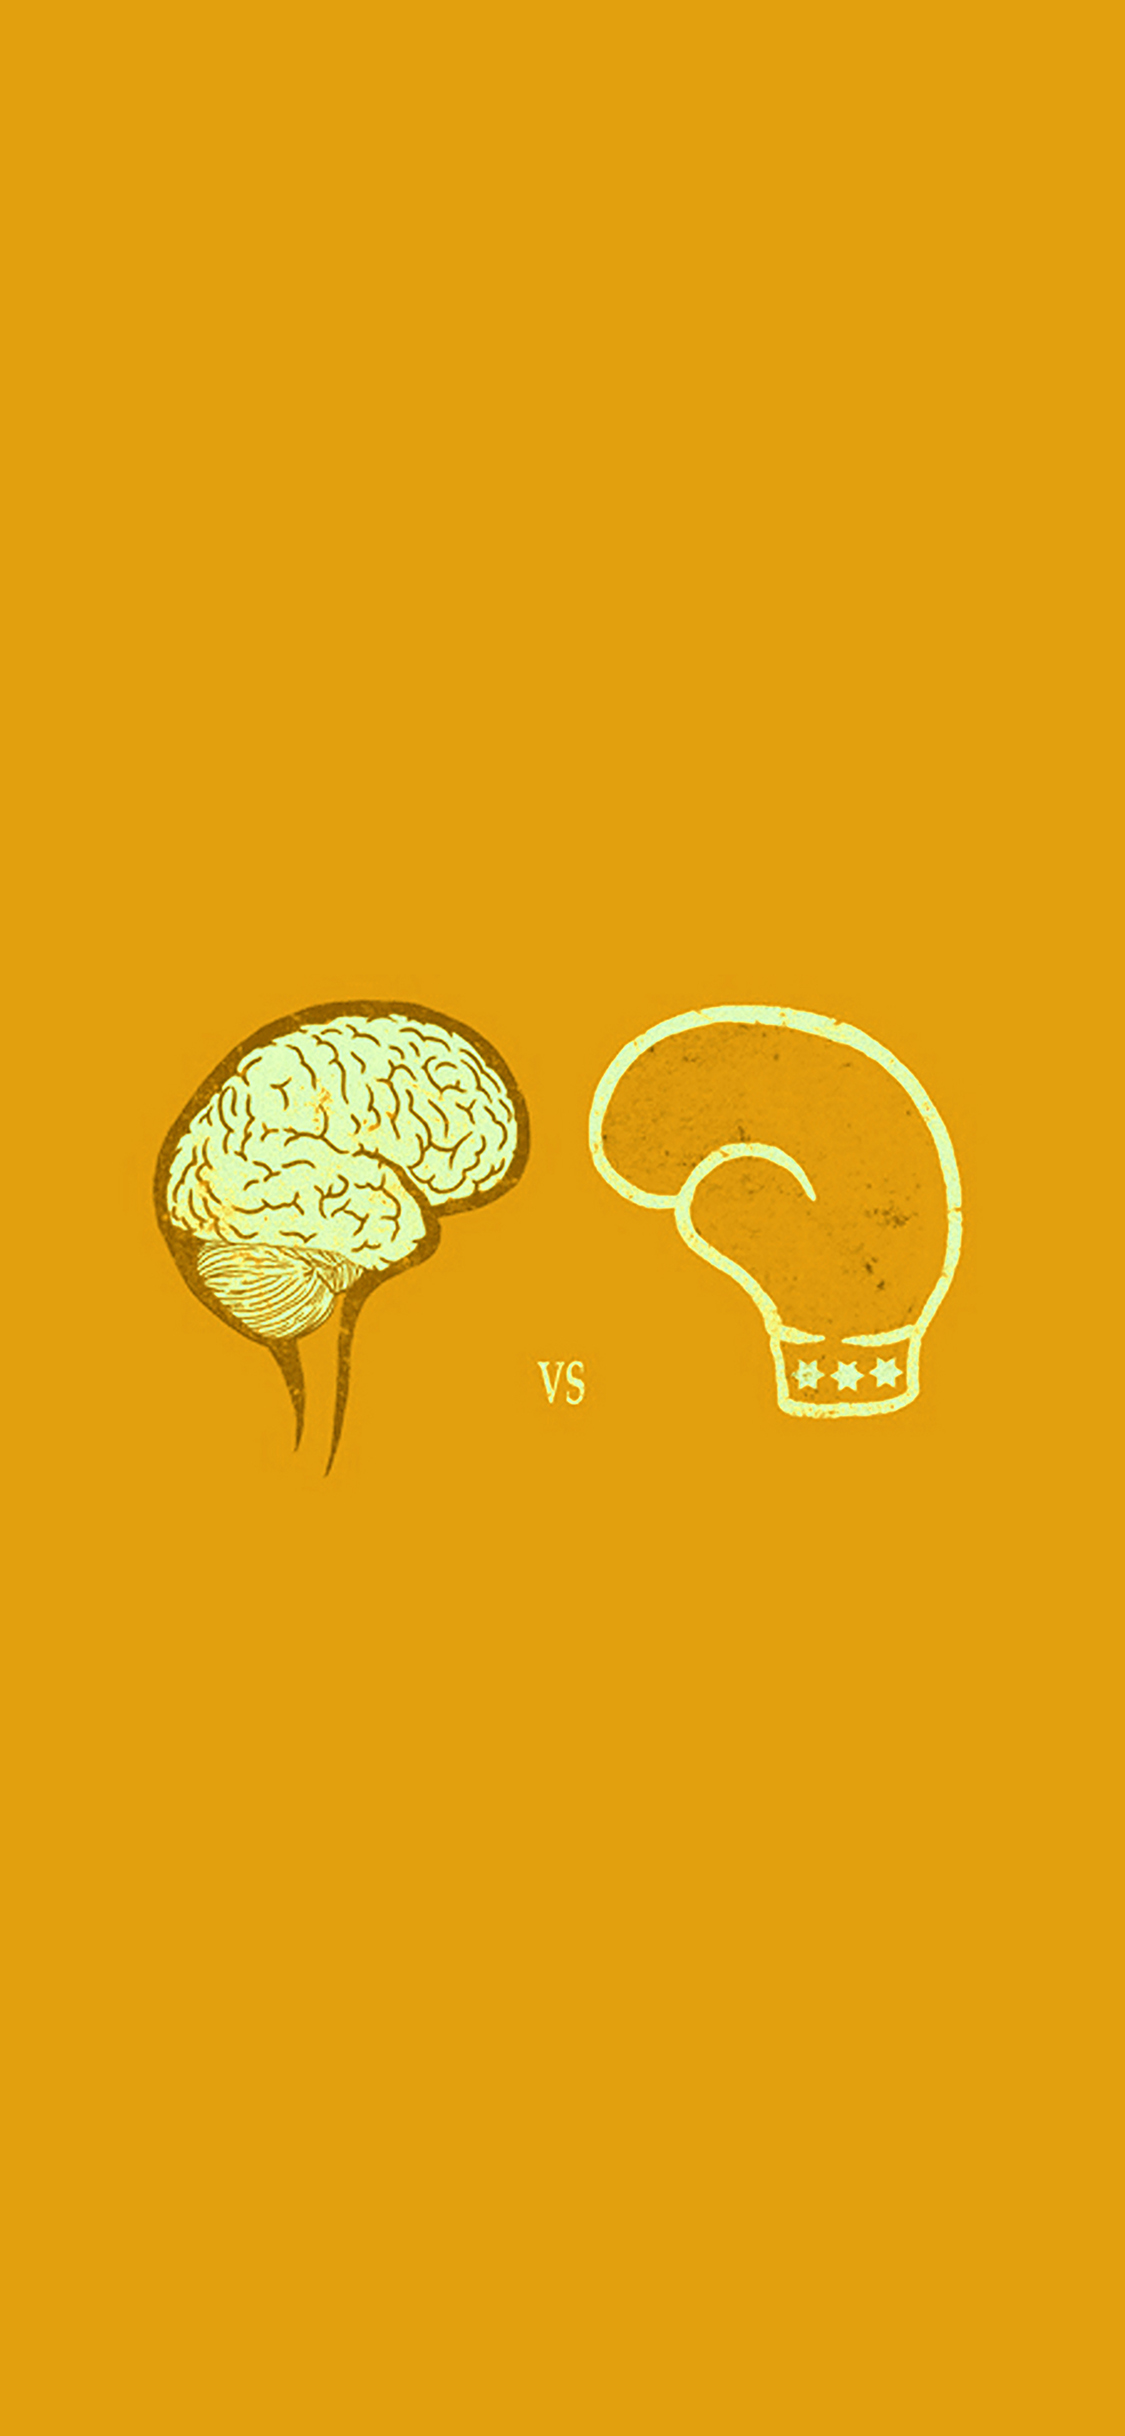 iPhonexpapers.com-Apple-iPhone-wallpaper-ai23-brain-vs-boxing-illust-gold-minimal-art